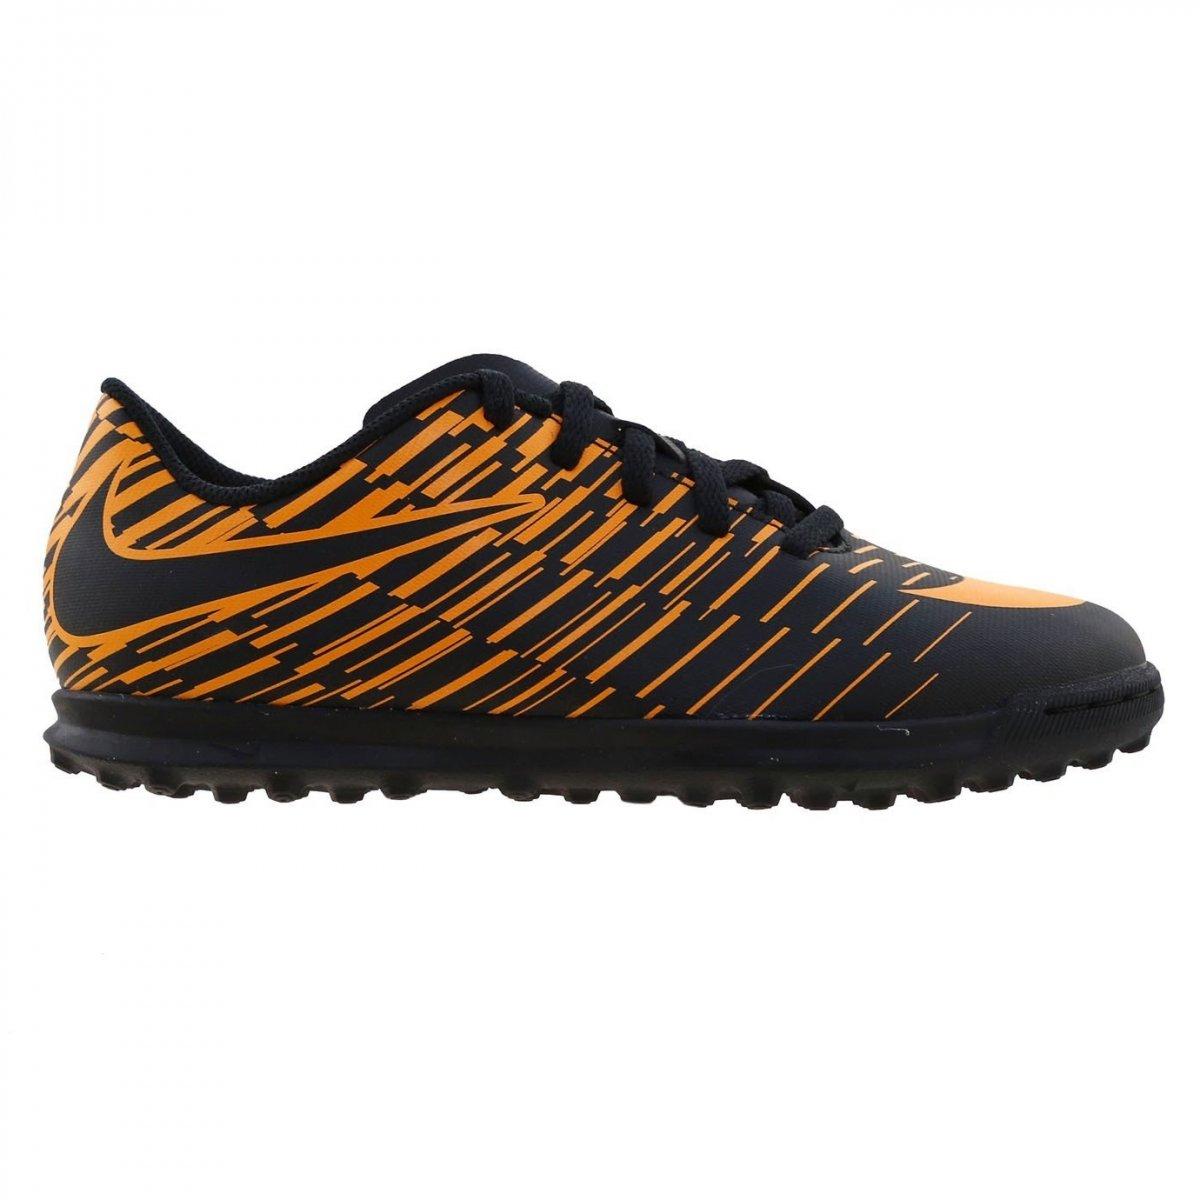 d09e629359 Chuteira F7 Nike Bravatax II TF 844437-002 Preto Laranja